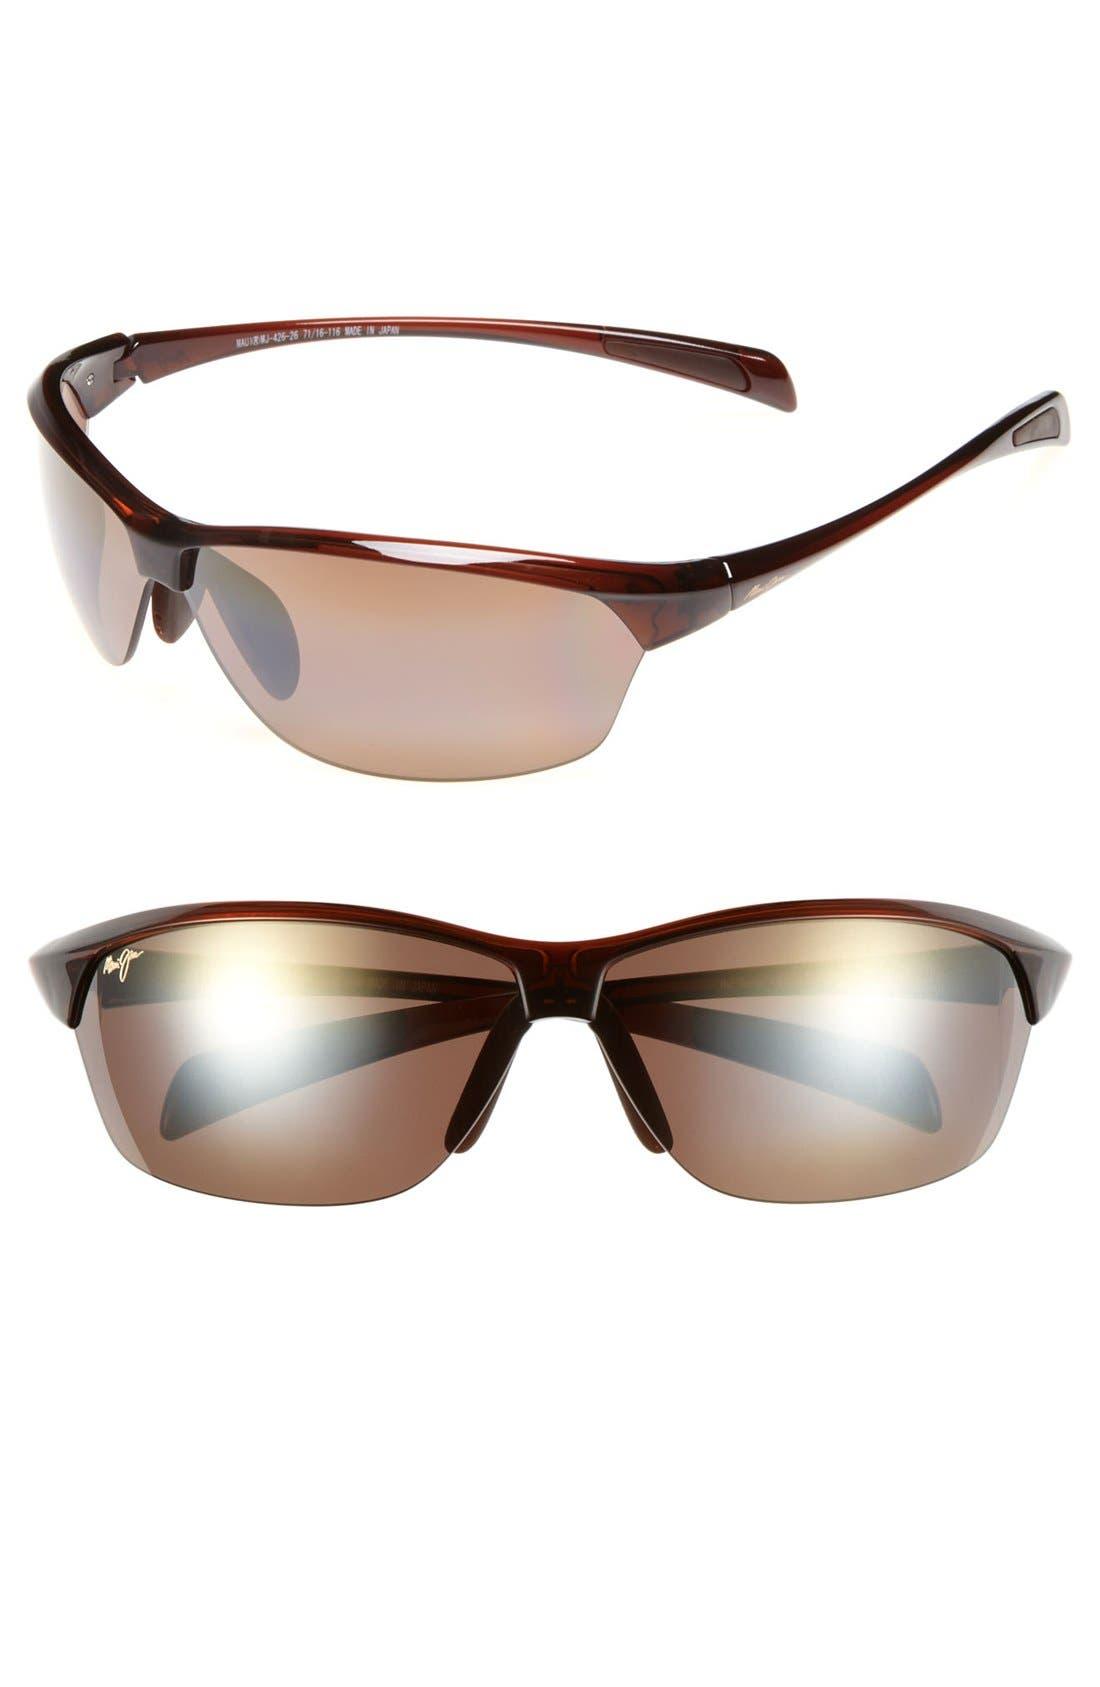 Maui Jim Hot Sands 71mm PolarizedPlus2® Sunglasses